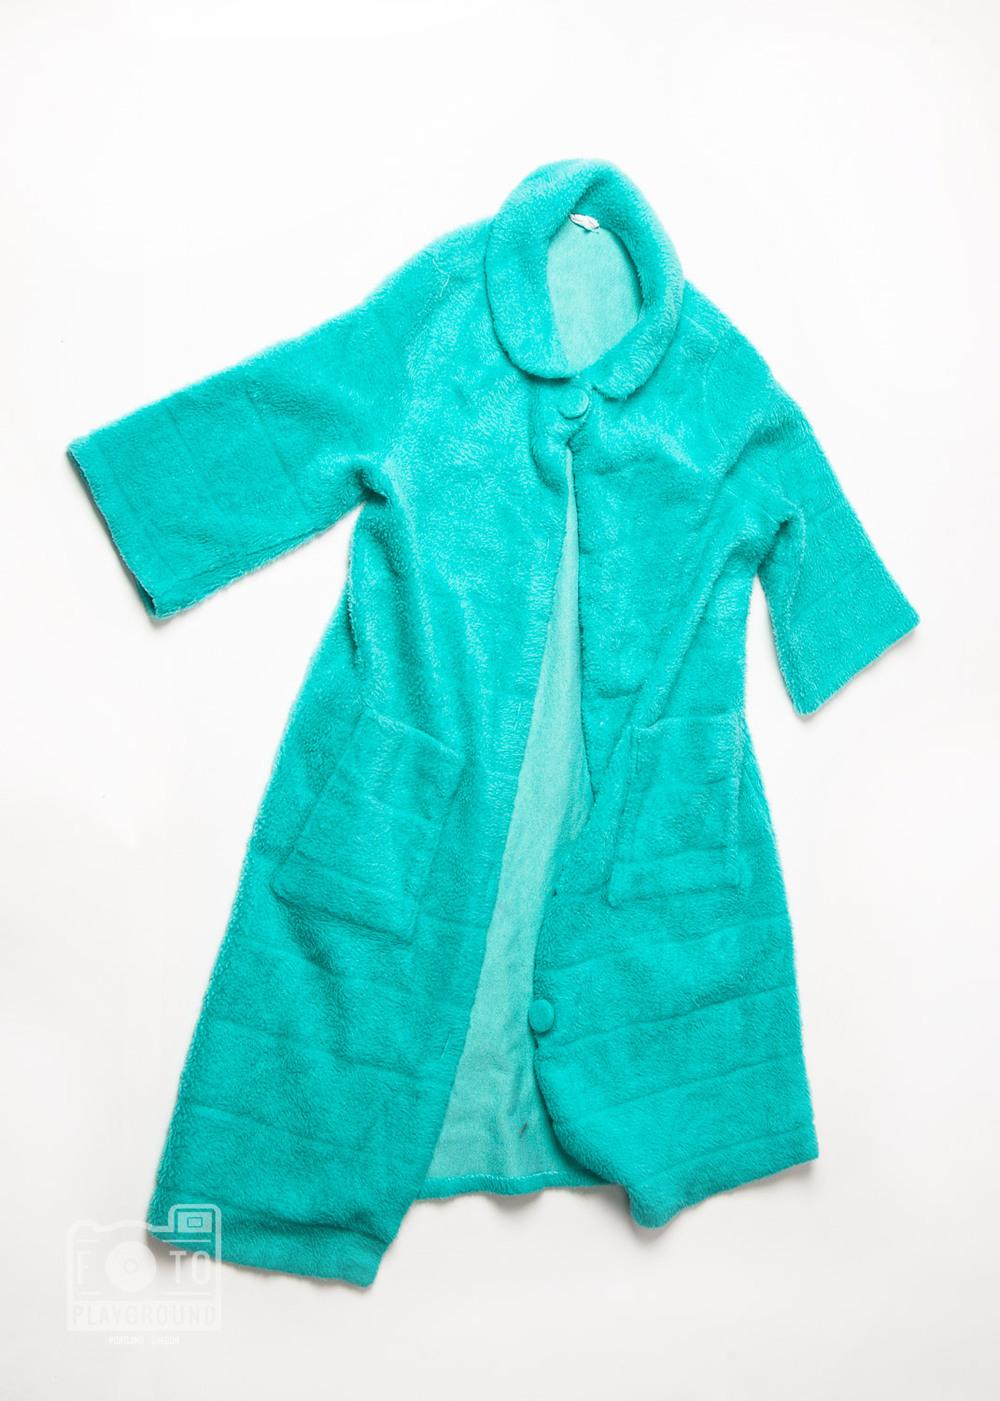 vintage turquoise housecoat